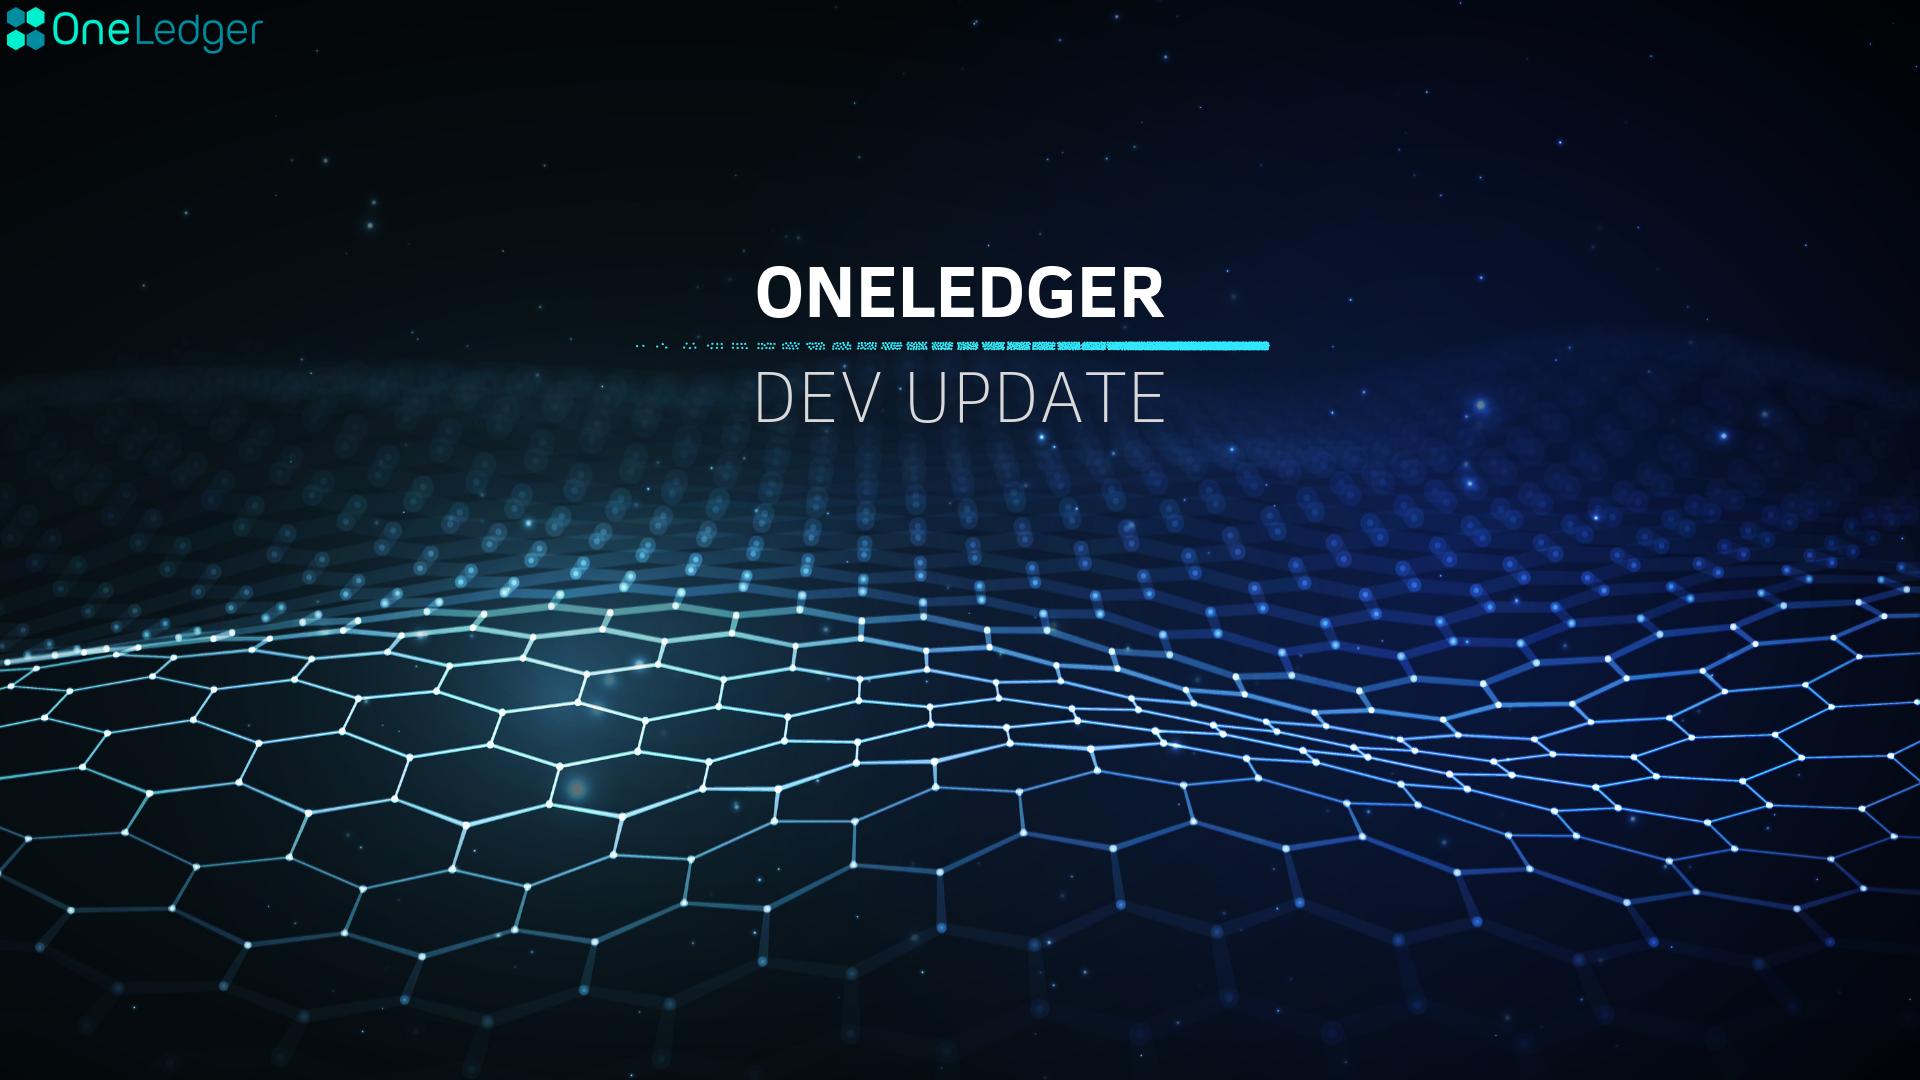 Development Update